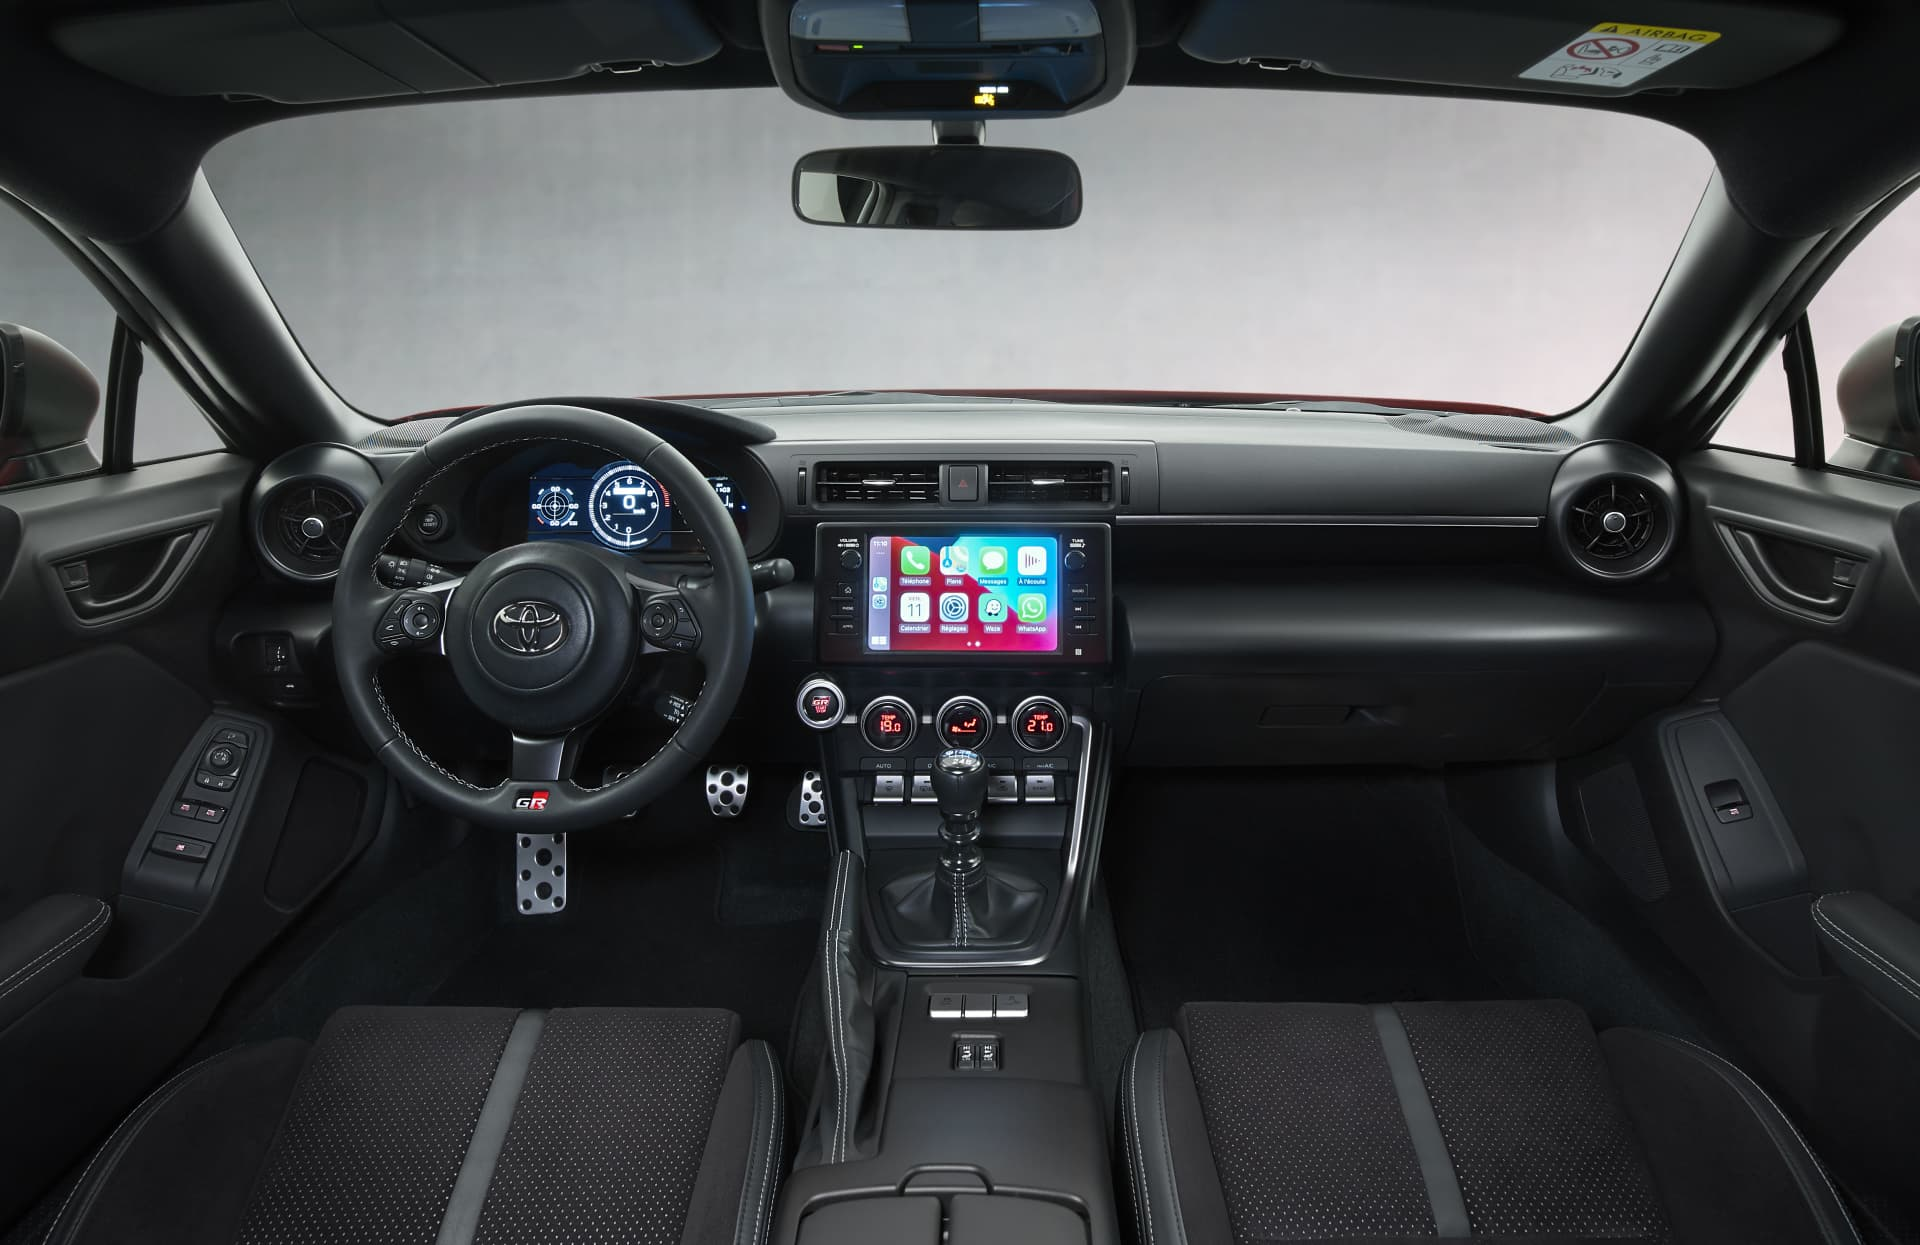 Toyota Gr86 2022 Interior Volante Pantallas 0421 008